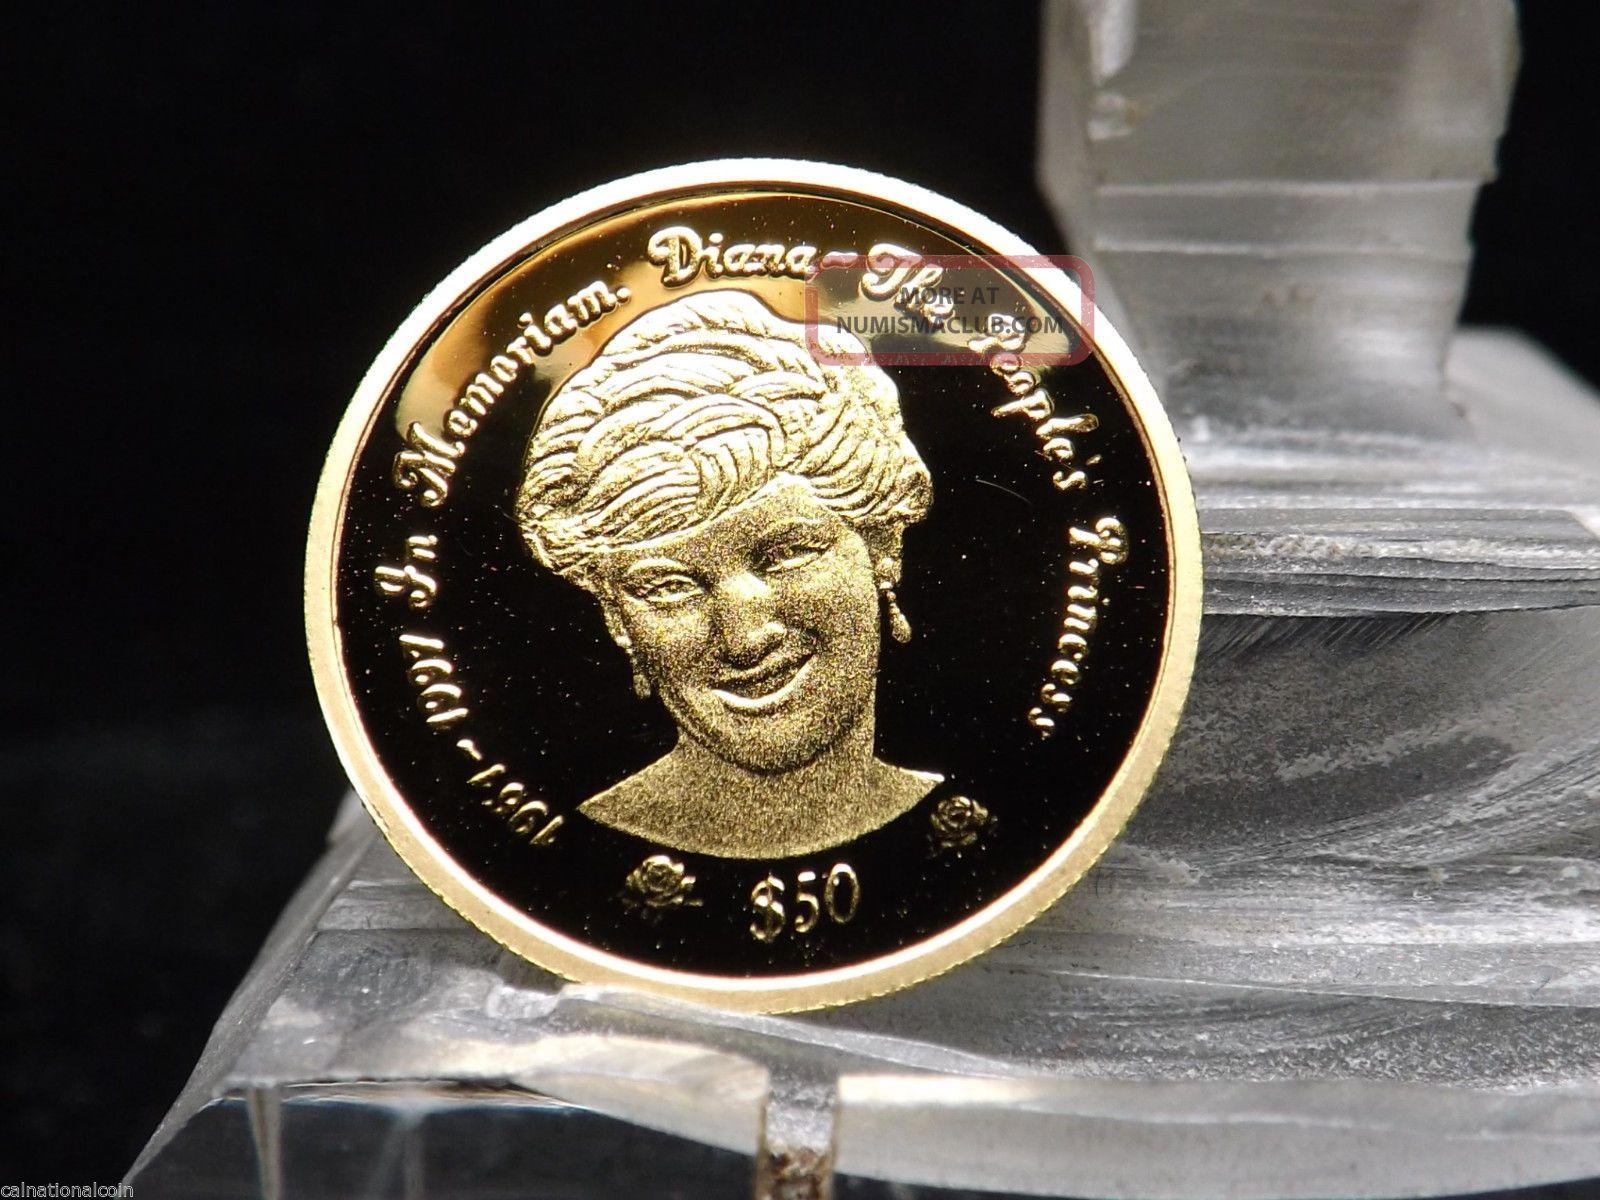 1997 Sierra Leone Princess Diana Proof 50 Pure Gold Coin